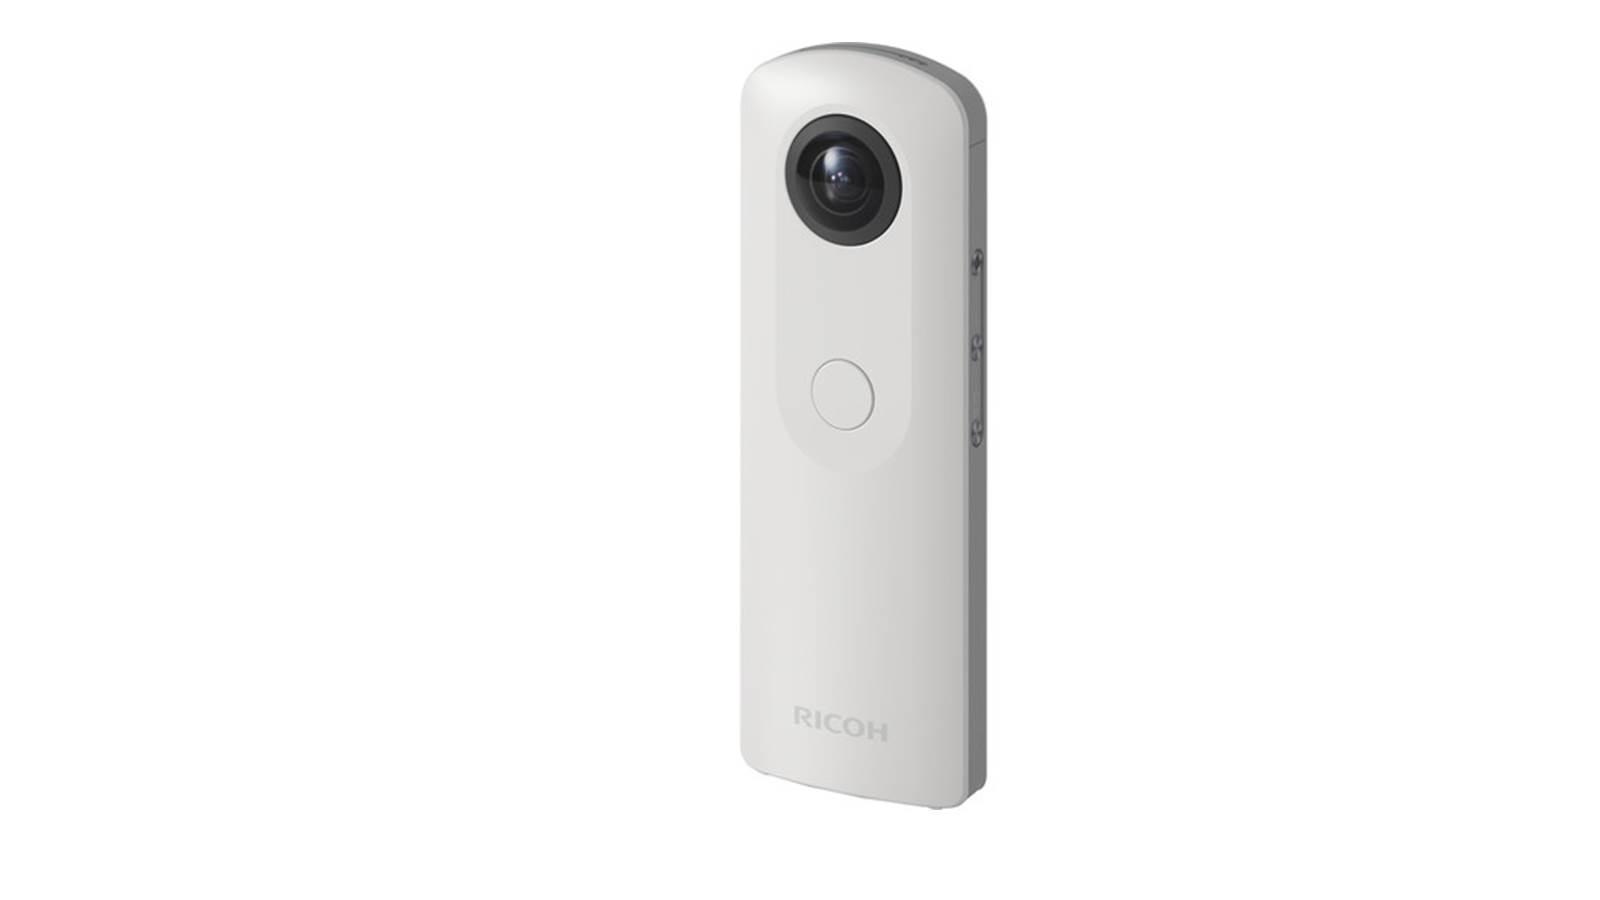 theta camera - Monza berglauf-verband com